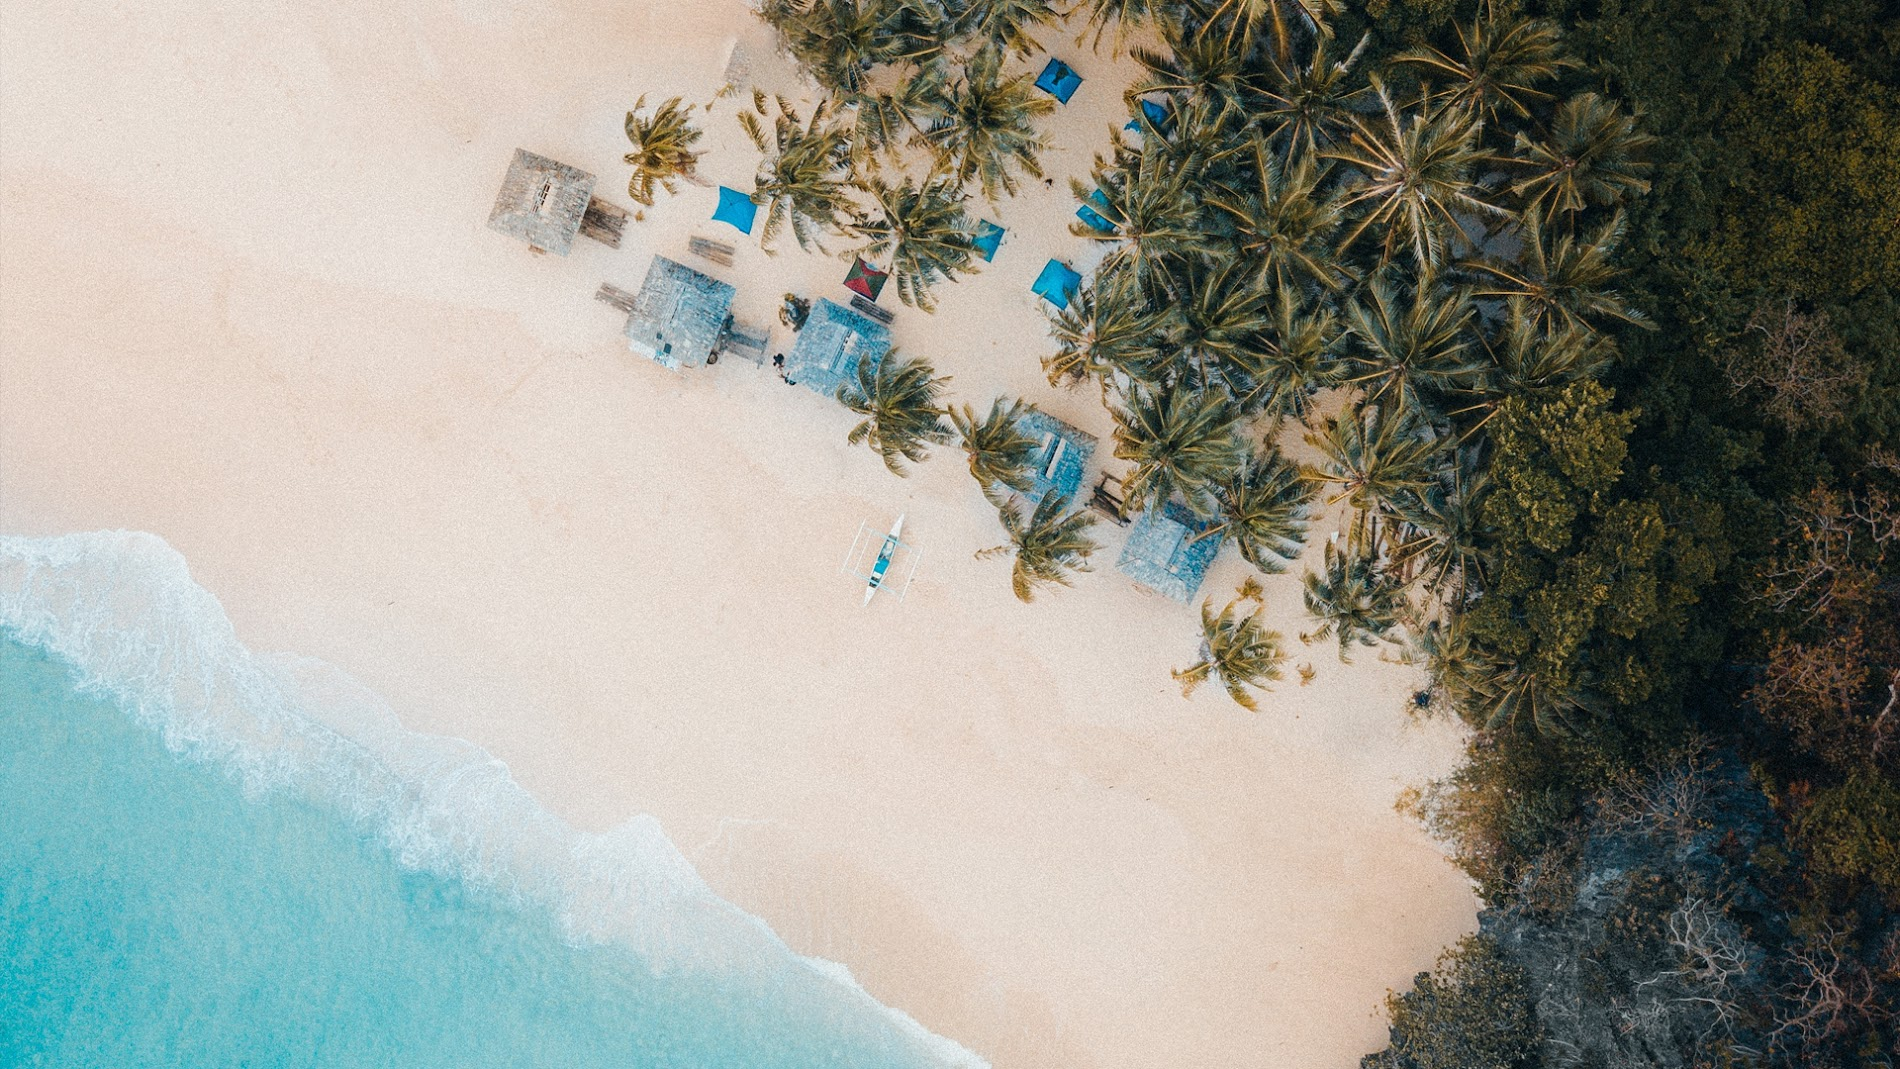 Beach Drone View HD Wallpaper